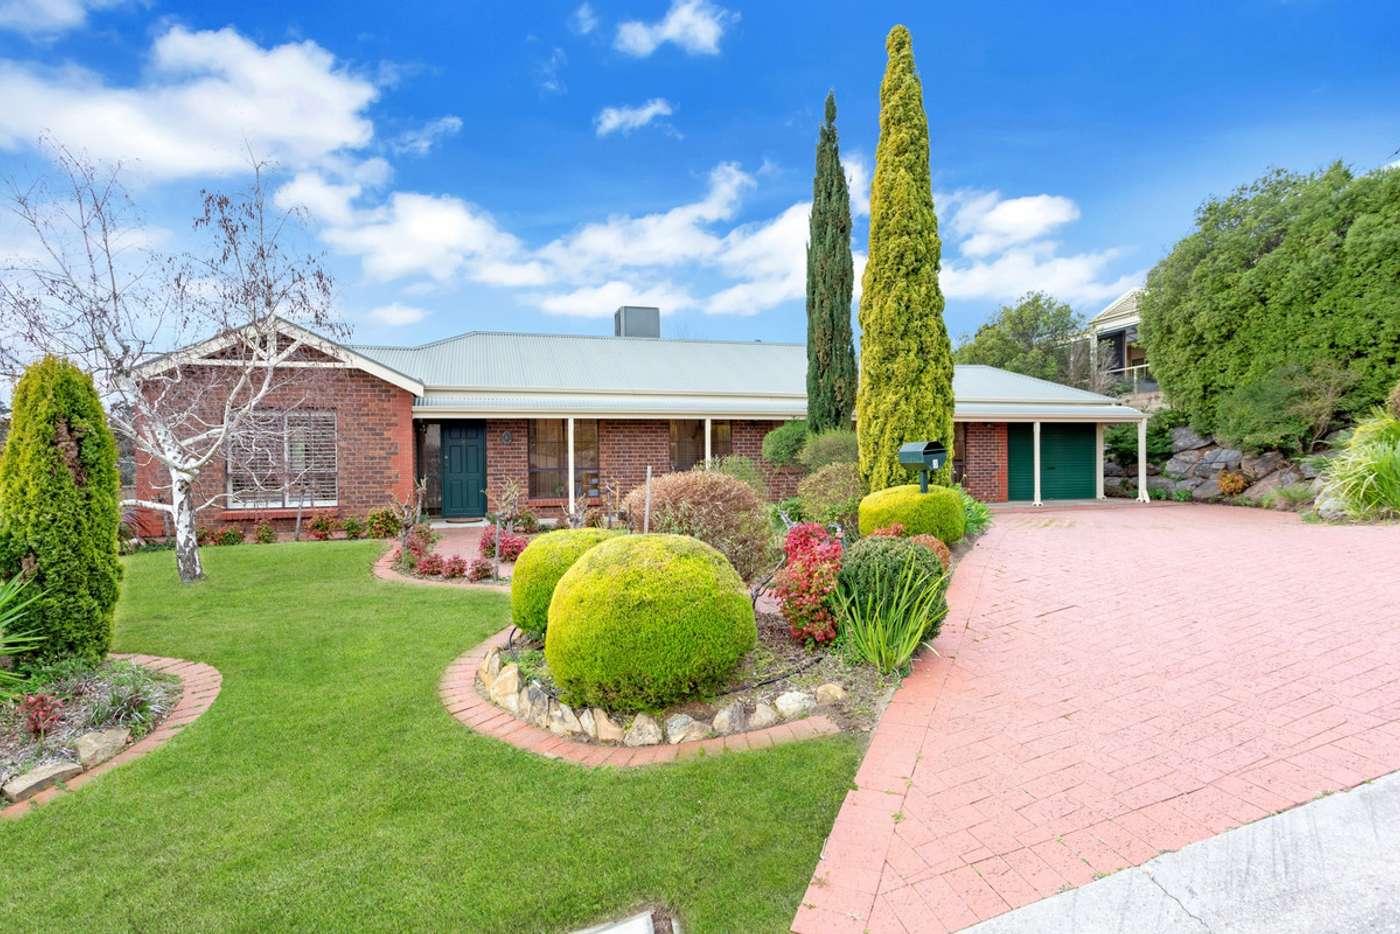 Main view of Homely house listing, 3 Coachwood Drive, Aberfoyle Park SA 5159